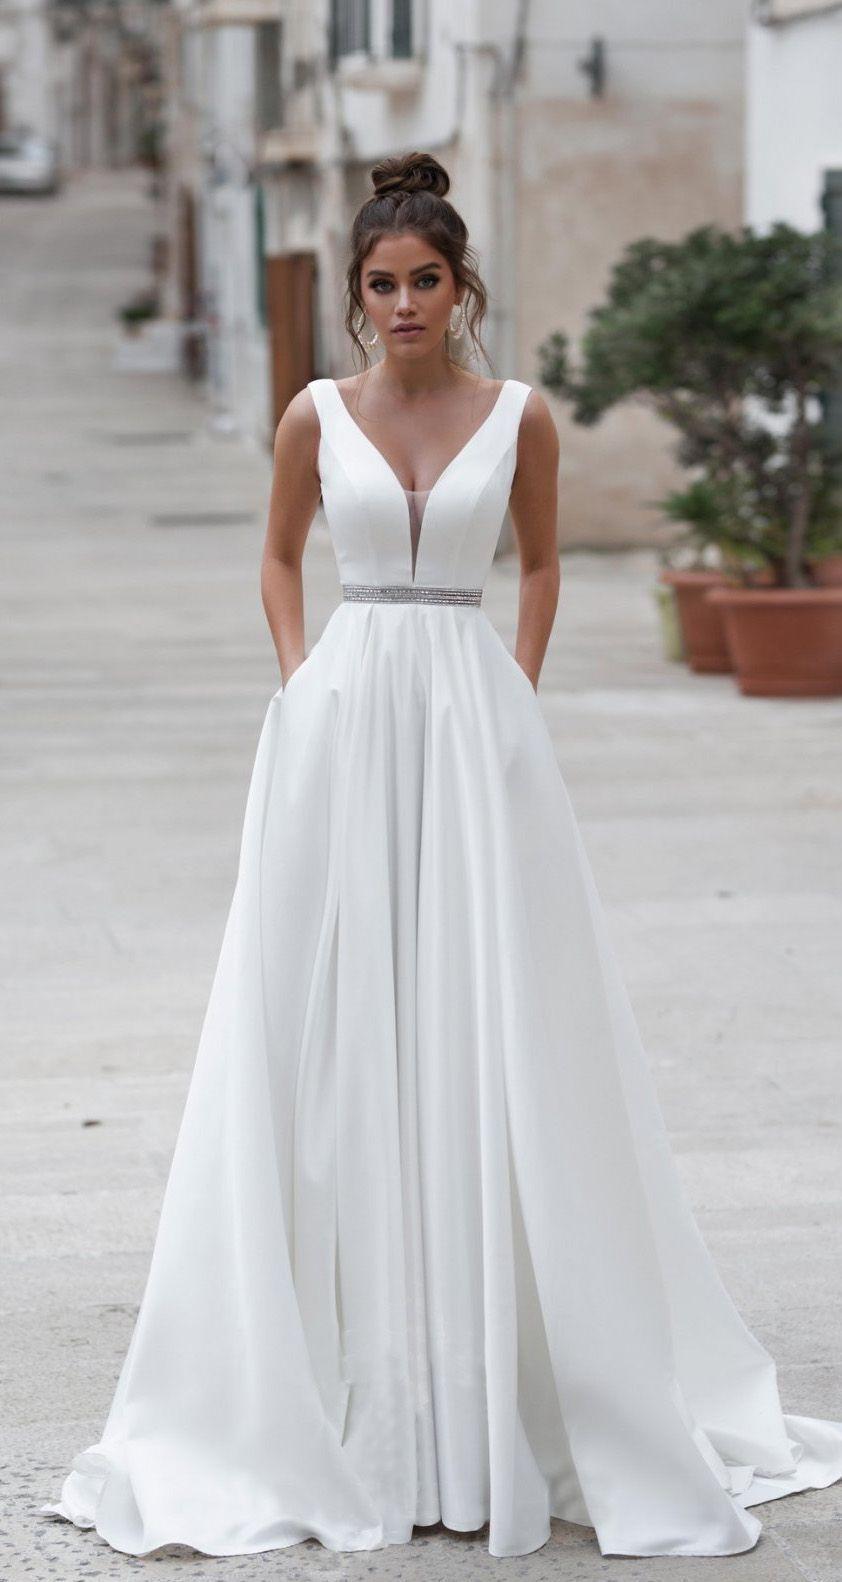 Jurk Hippie Kort En Unique Trouwjurken Strapless In 2020 Top Wedding Dresses Backless Bridal Gowns Wedding Dress Trends [ 1582 x 842 Pixel ]